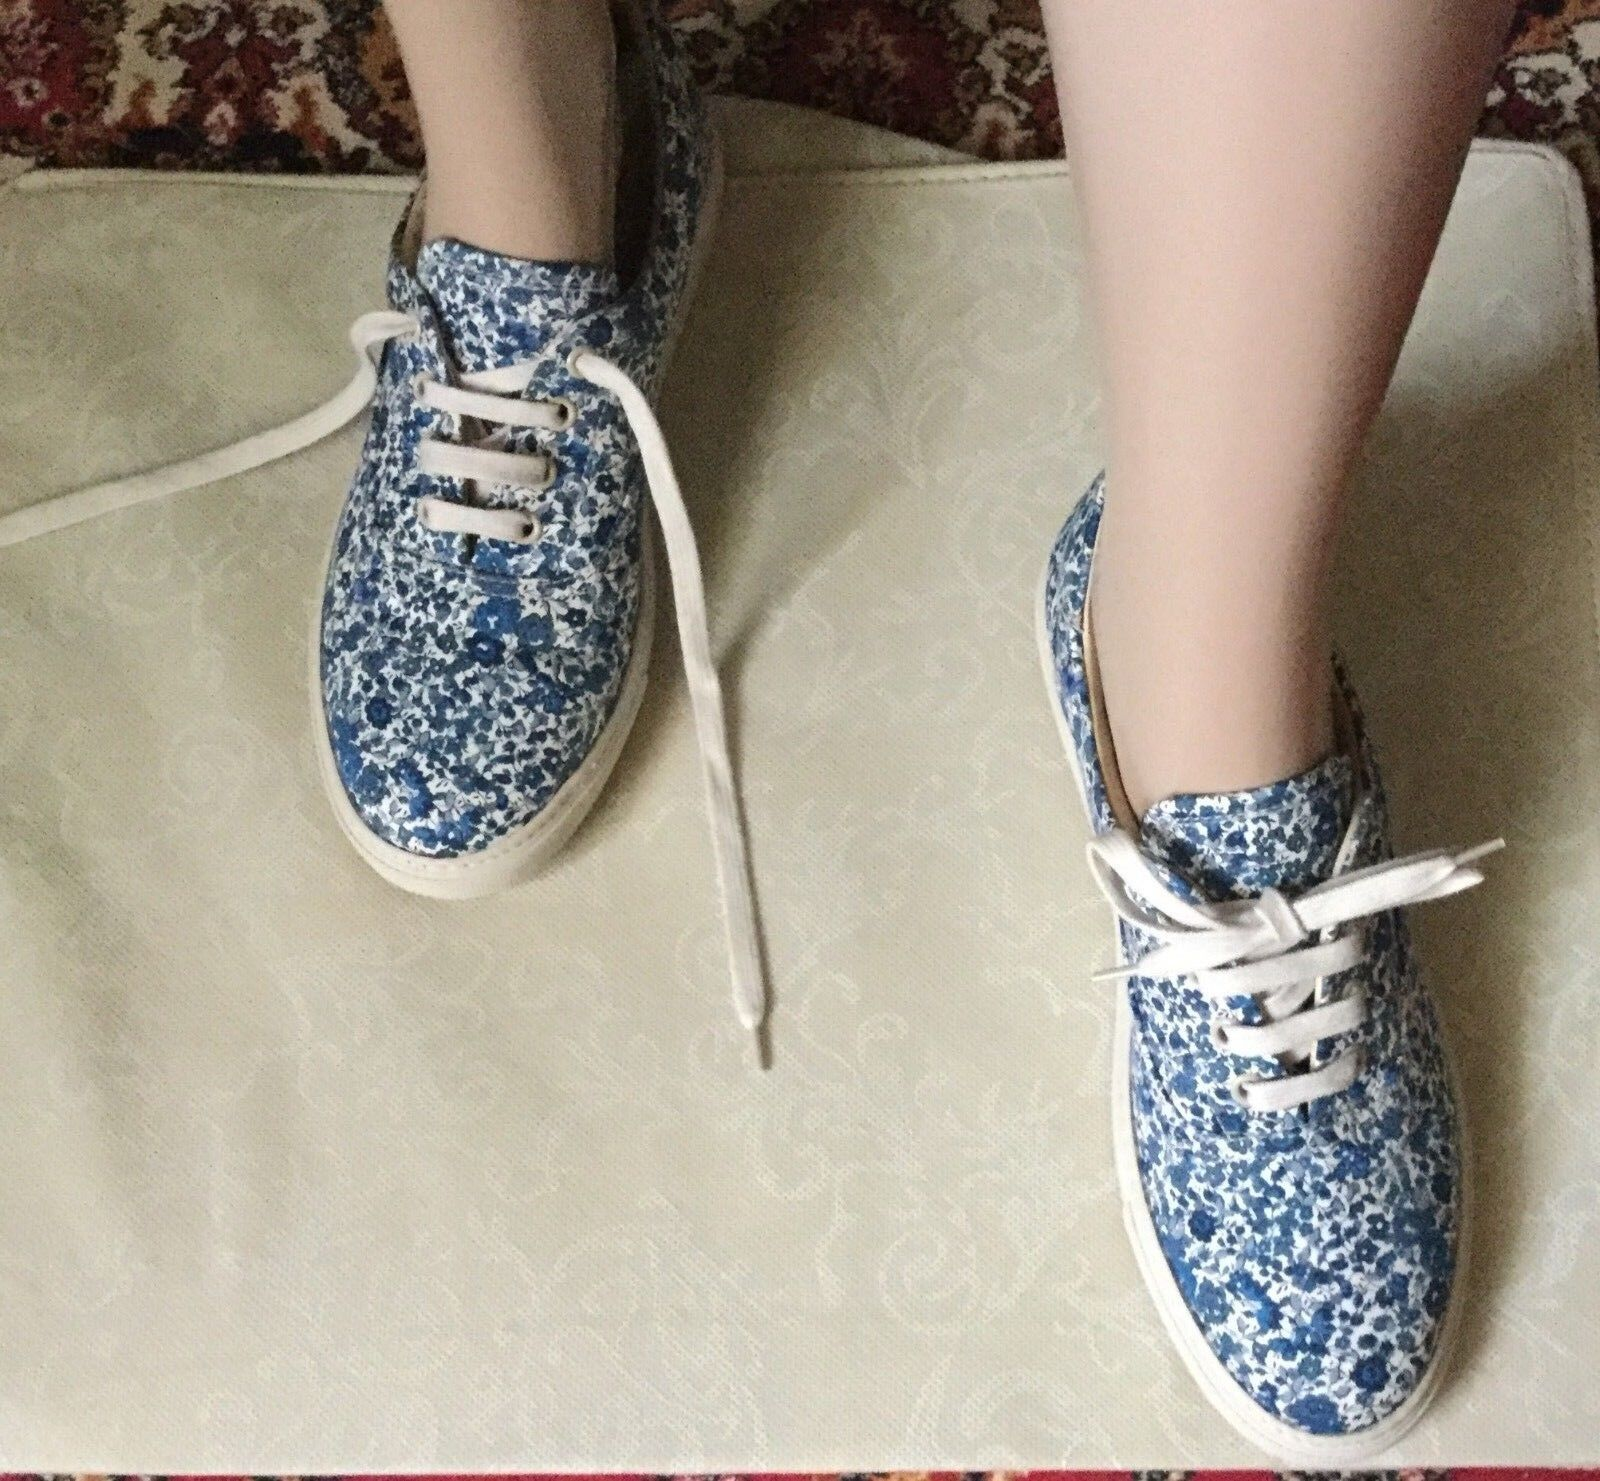 WEEKEND Max Mara scarpe da ginnastica PARIDE blue color, Woman, size 40 Scarpe Donna